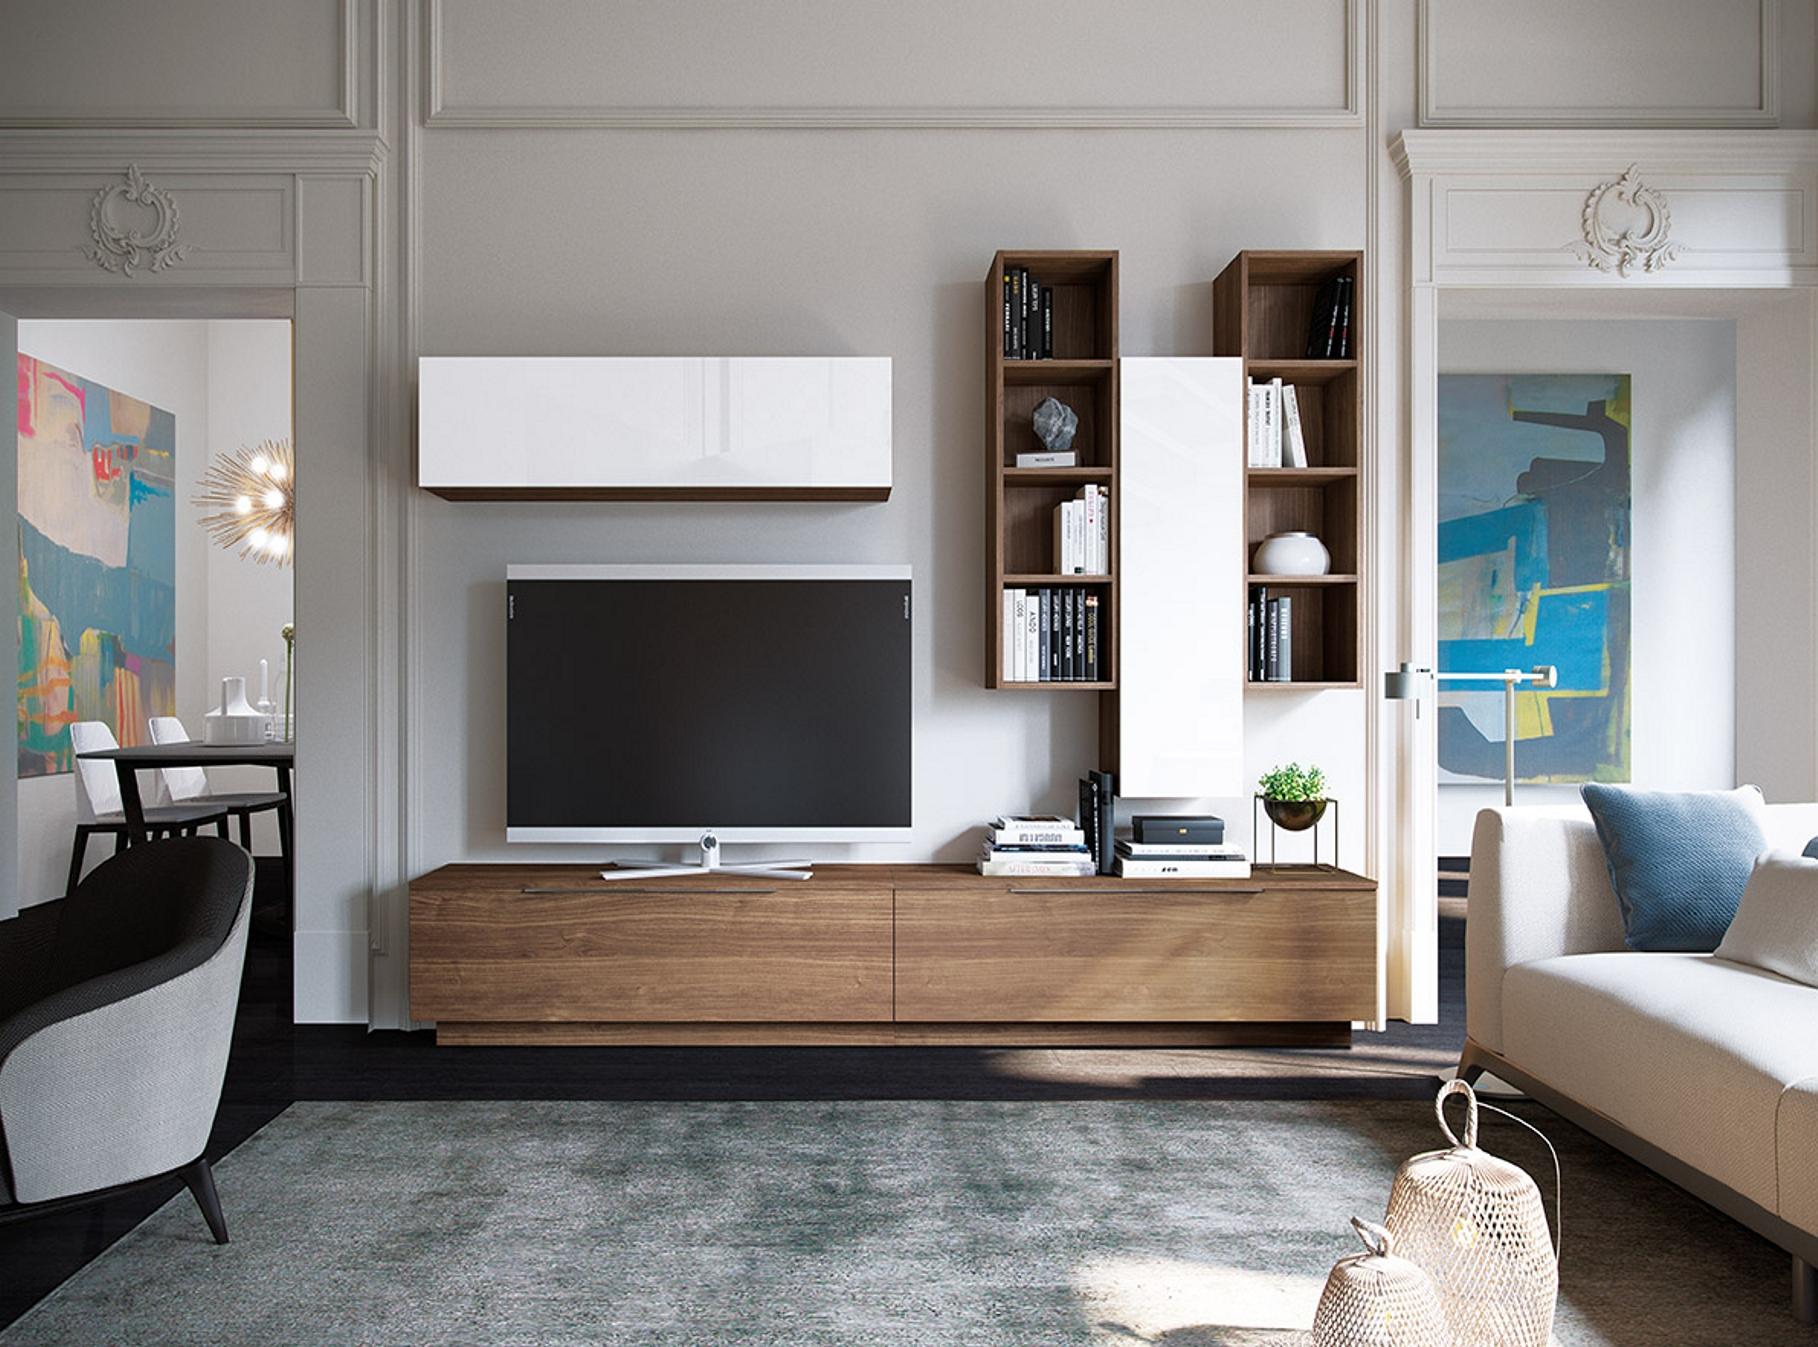 salon-moderno-Zion-3.0-muebles-paco-caballero-0907-5c8d32e09c6fd